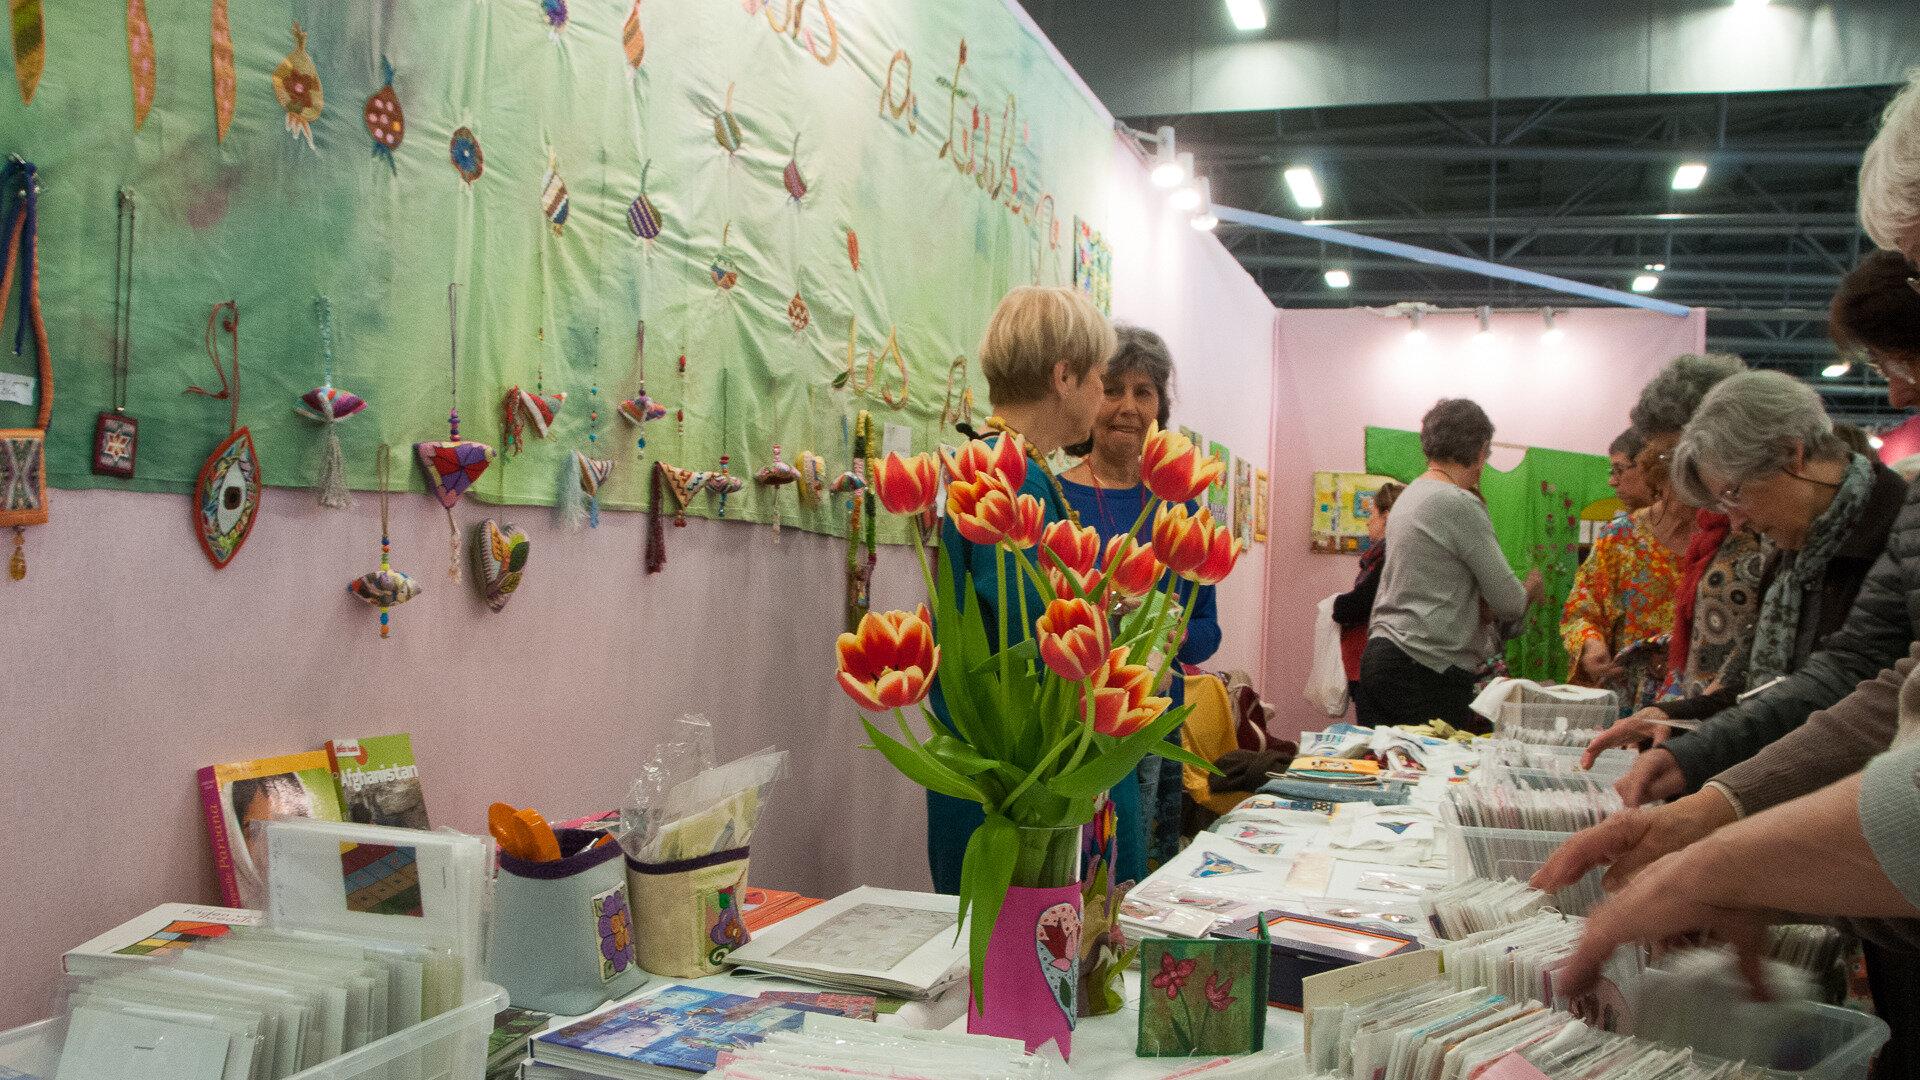 2019-04-26_11-17-39-Nantes-Tulip is a tulip-Pascale Goldenberg